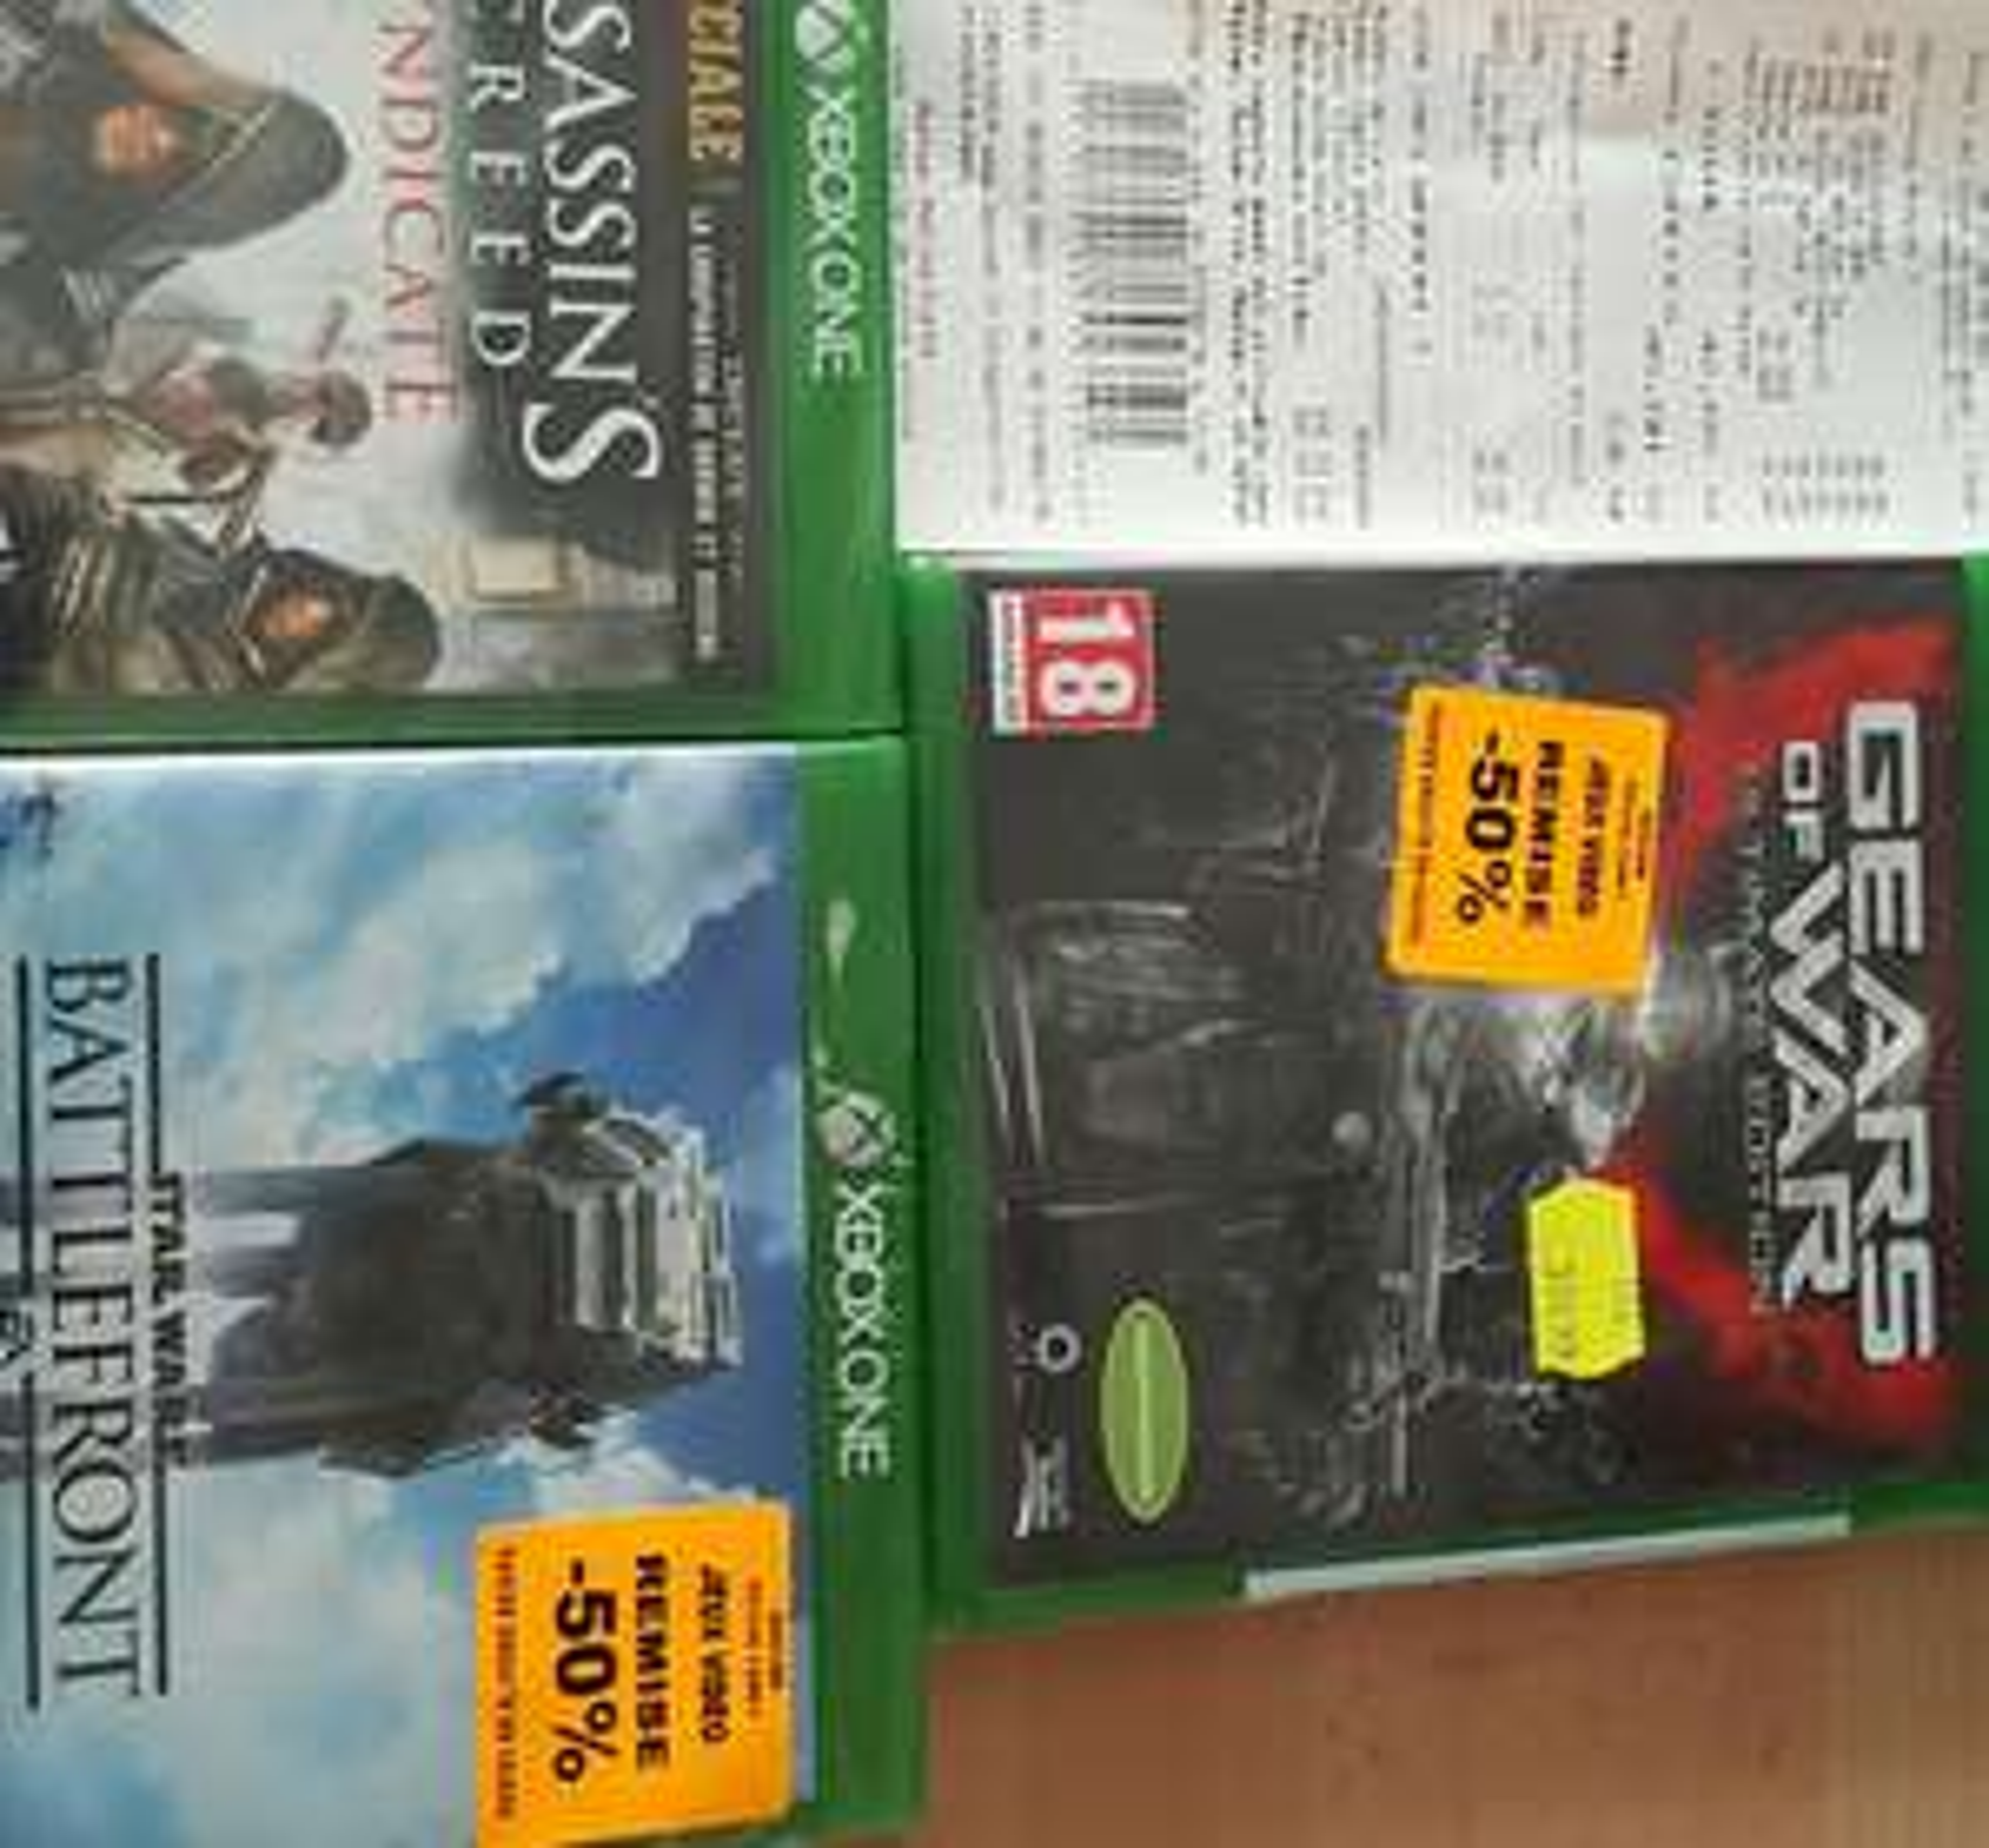 Sélection de jeux Xbox One en promotion - Ex : Gears of War Ultimate Edition à 12€, Assassin's Creed Syndicate et Star Wars Battlefront